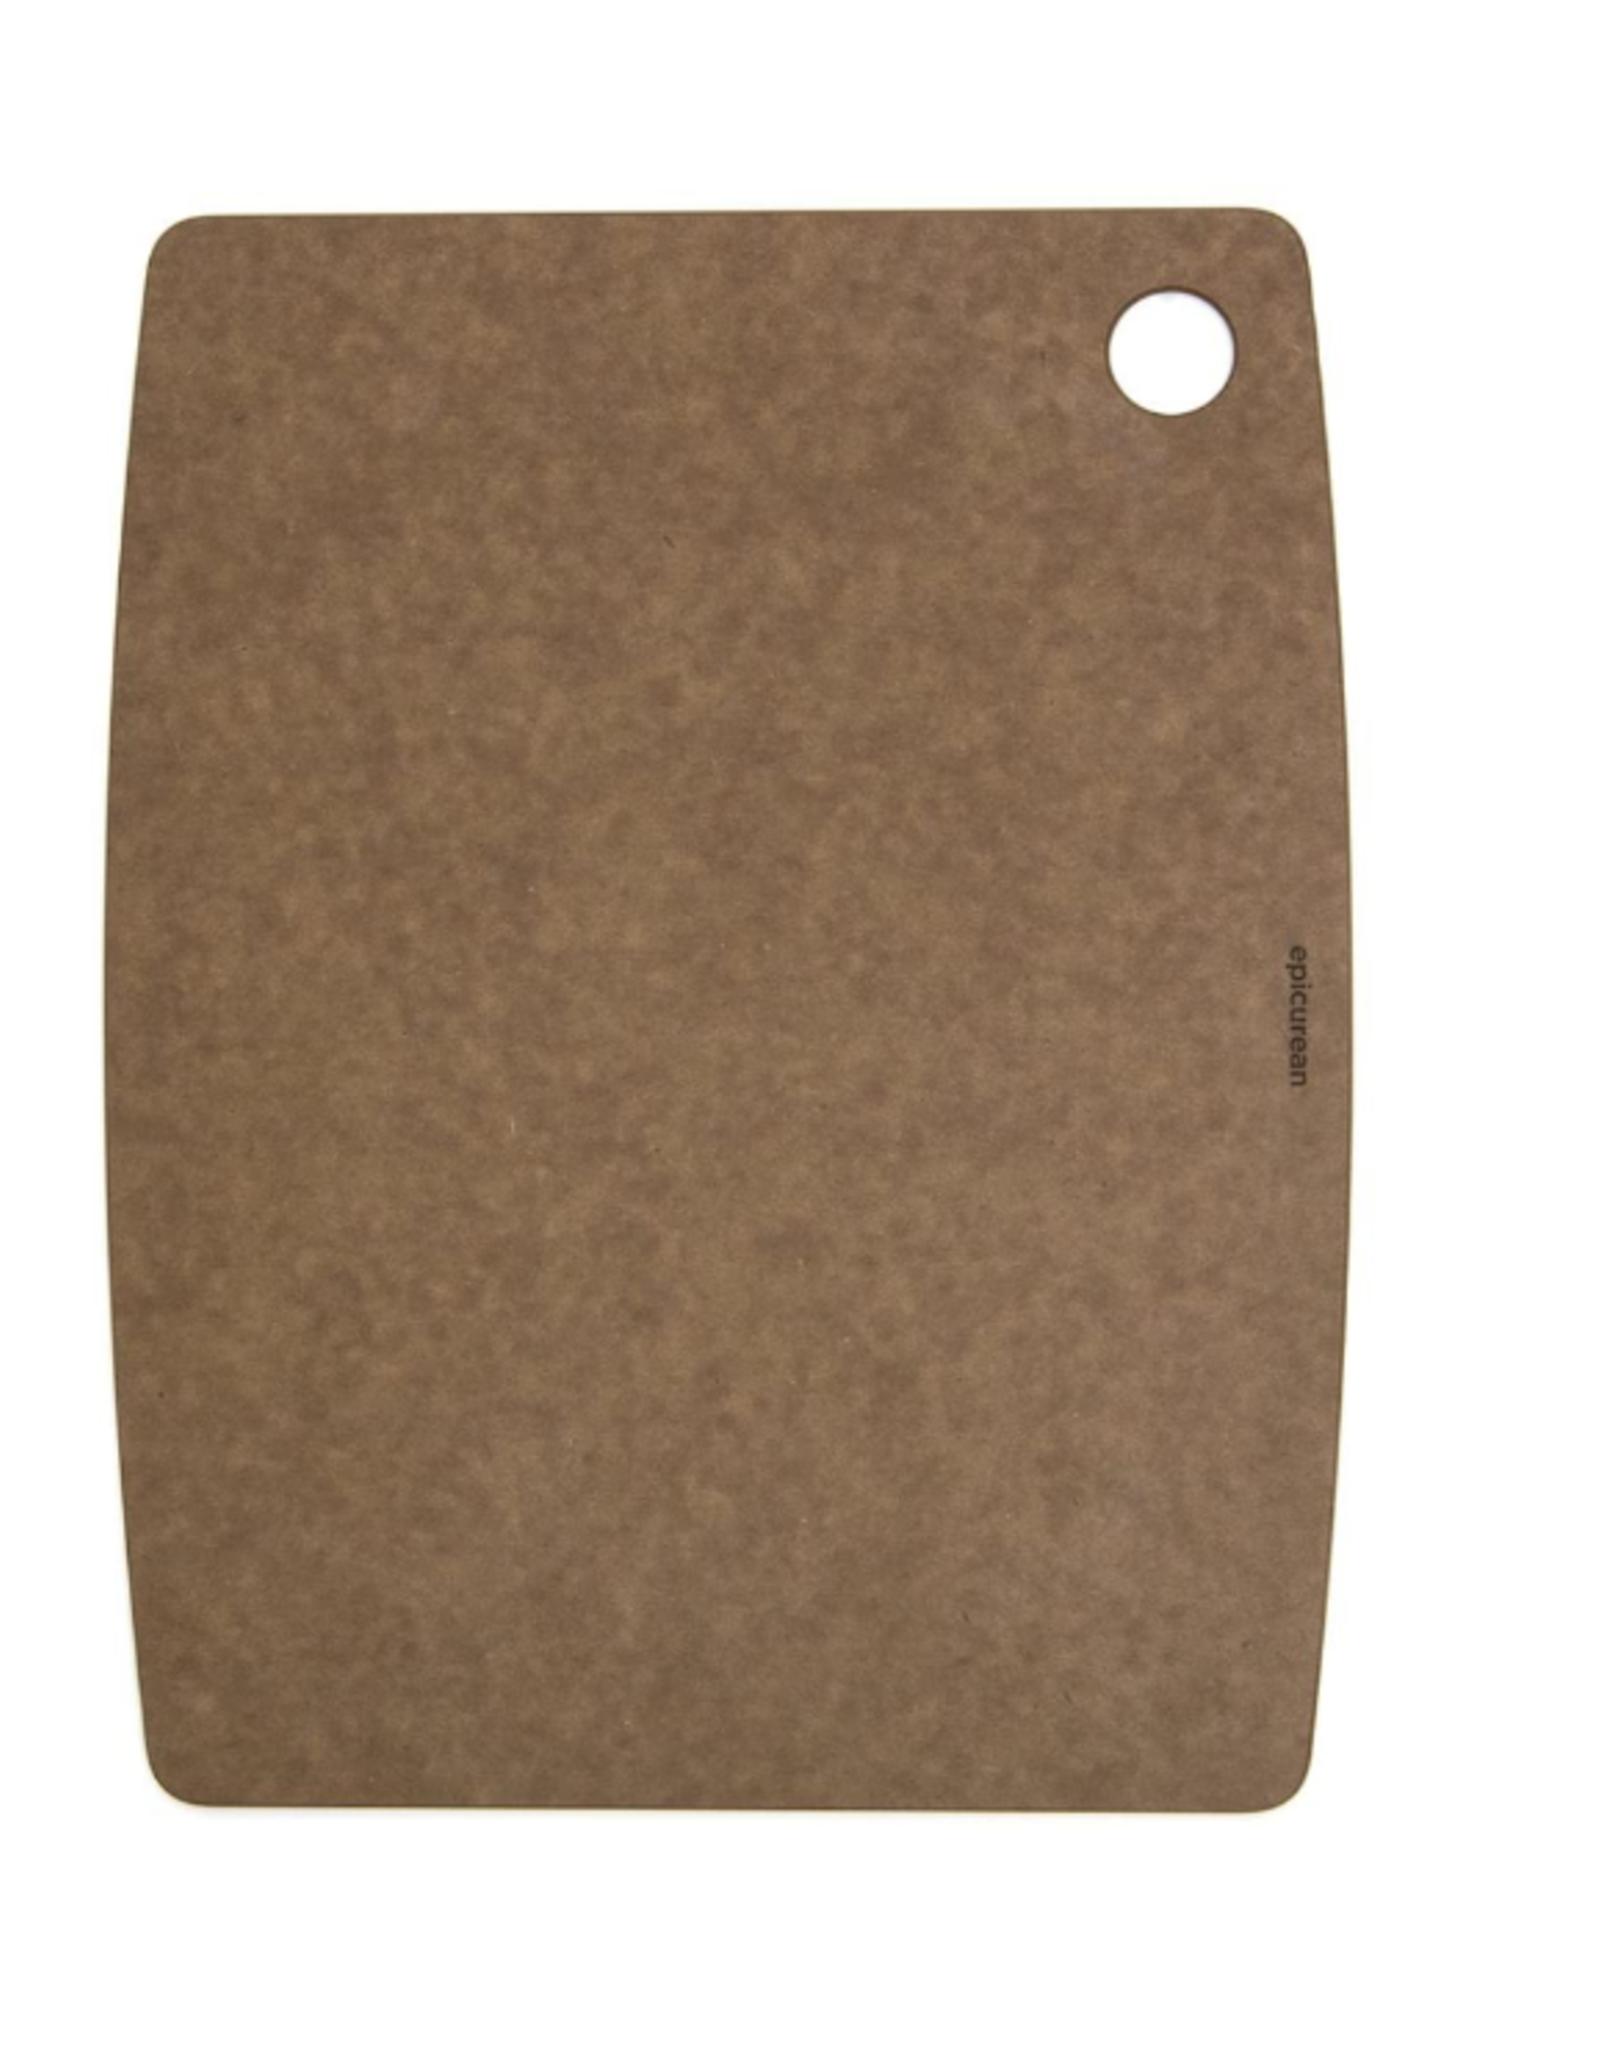 Epicurean Epicurean KS 15X11 Nutmeg Cutting Board